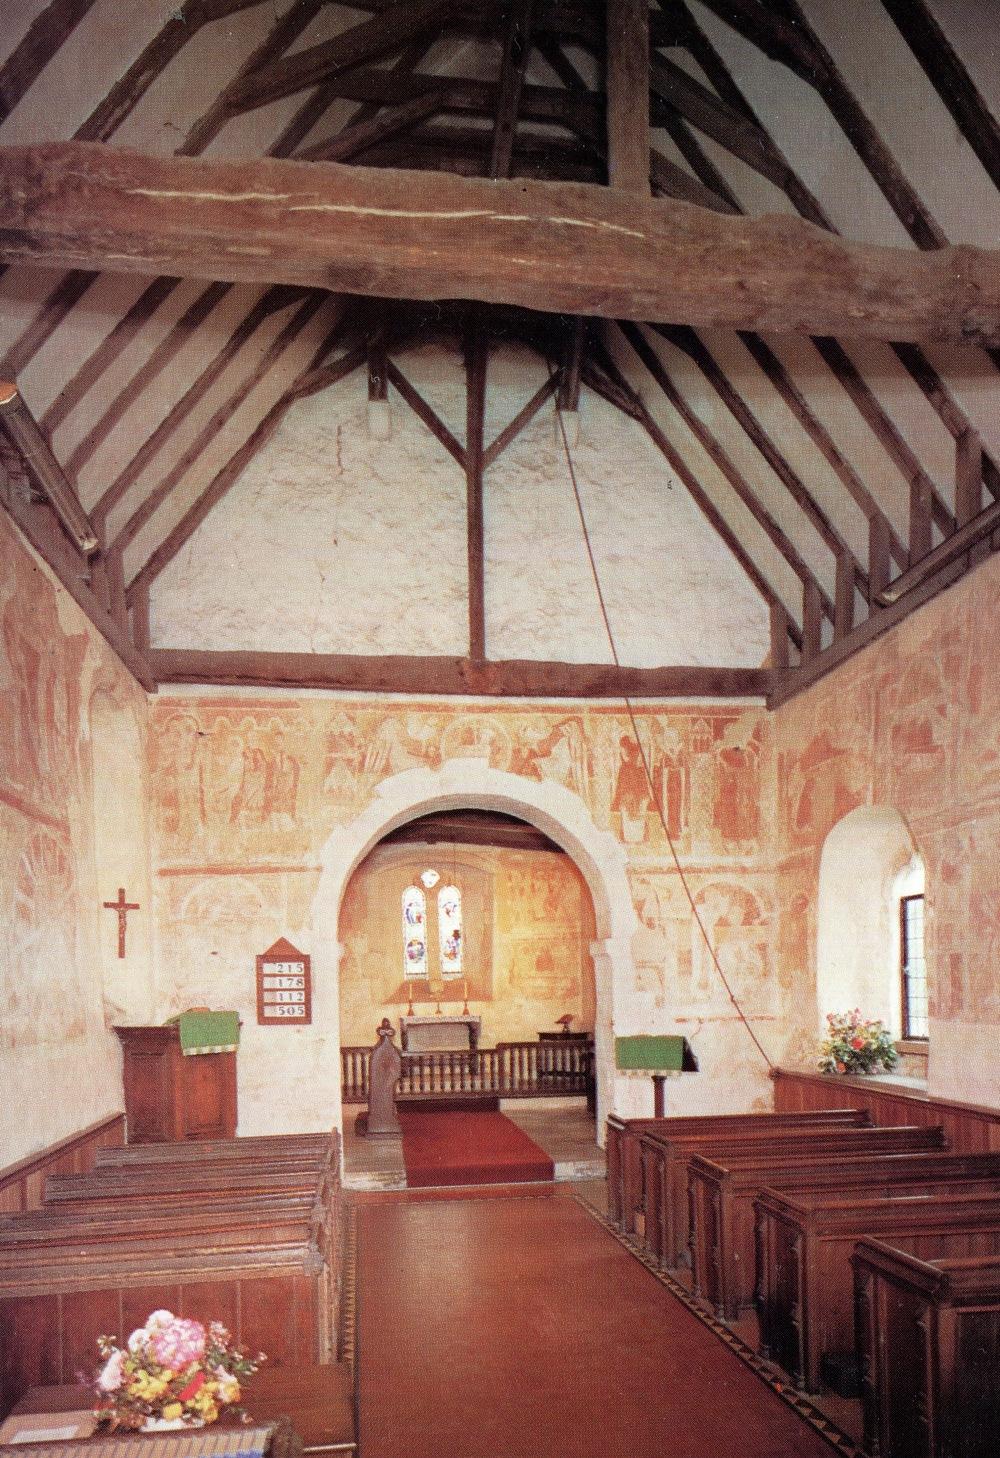 St Botolph's, Hardham